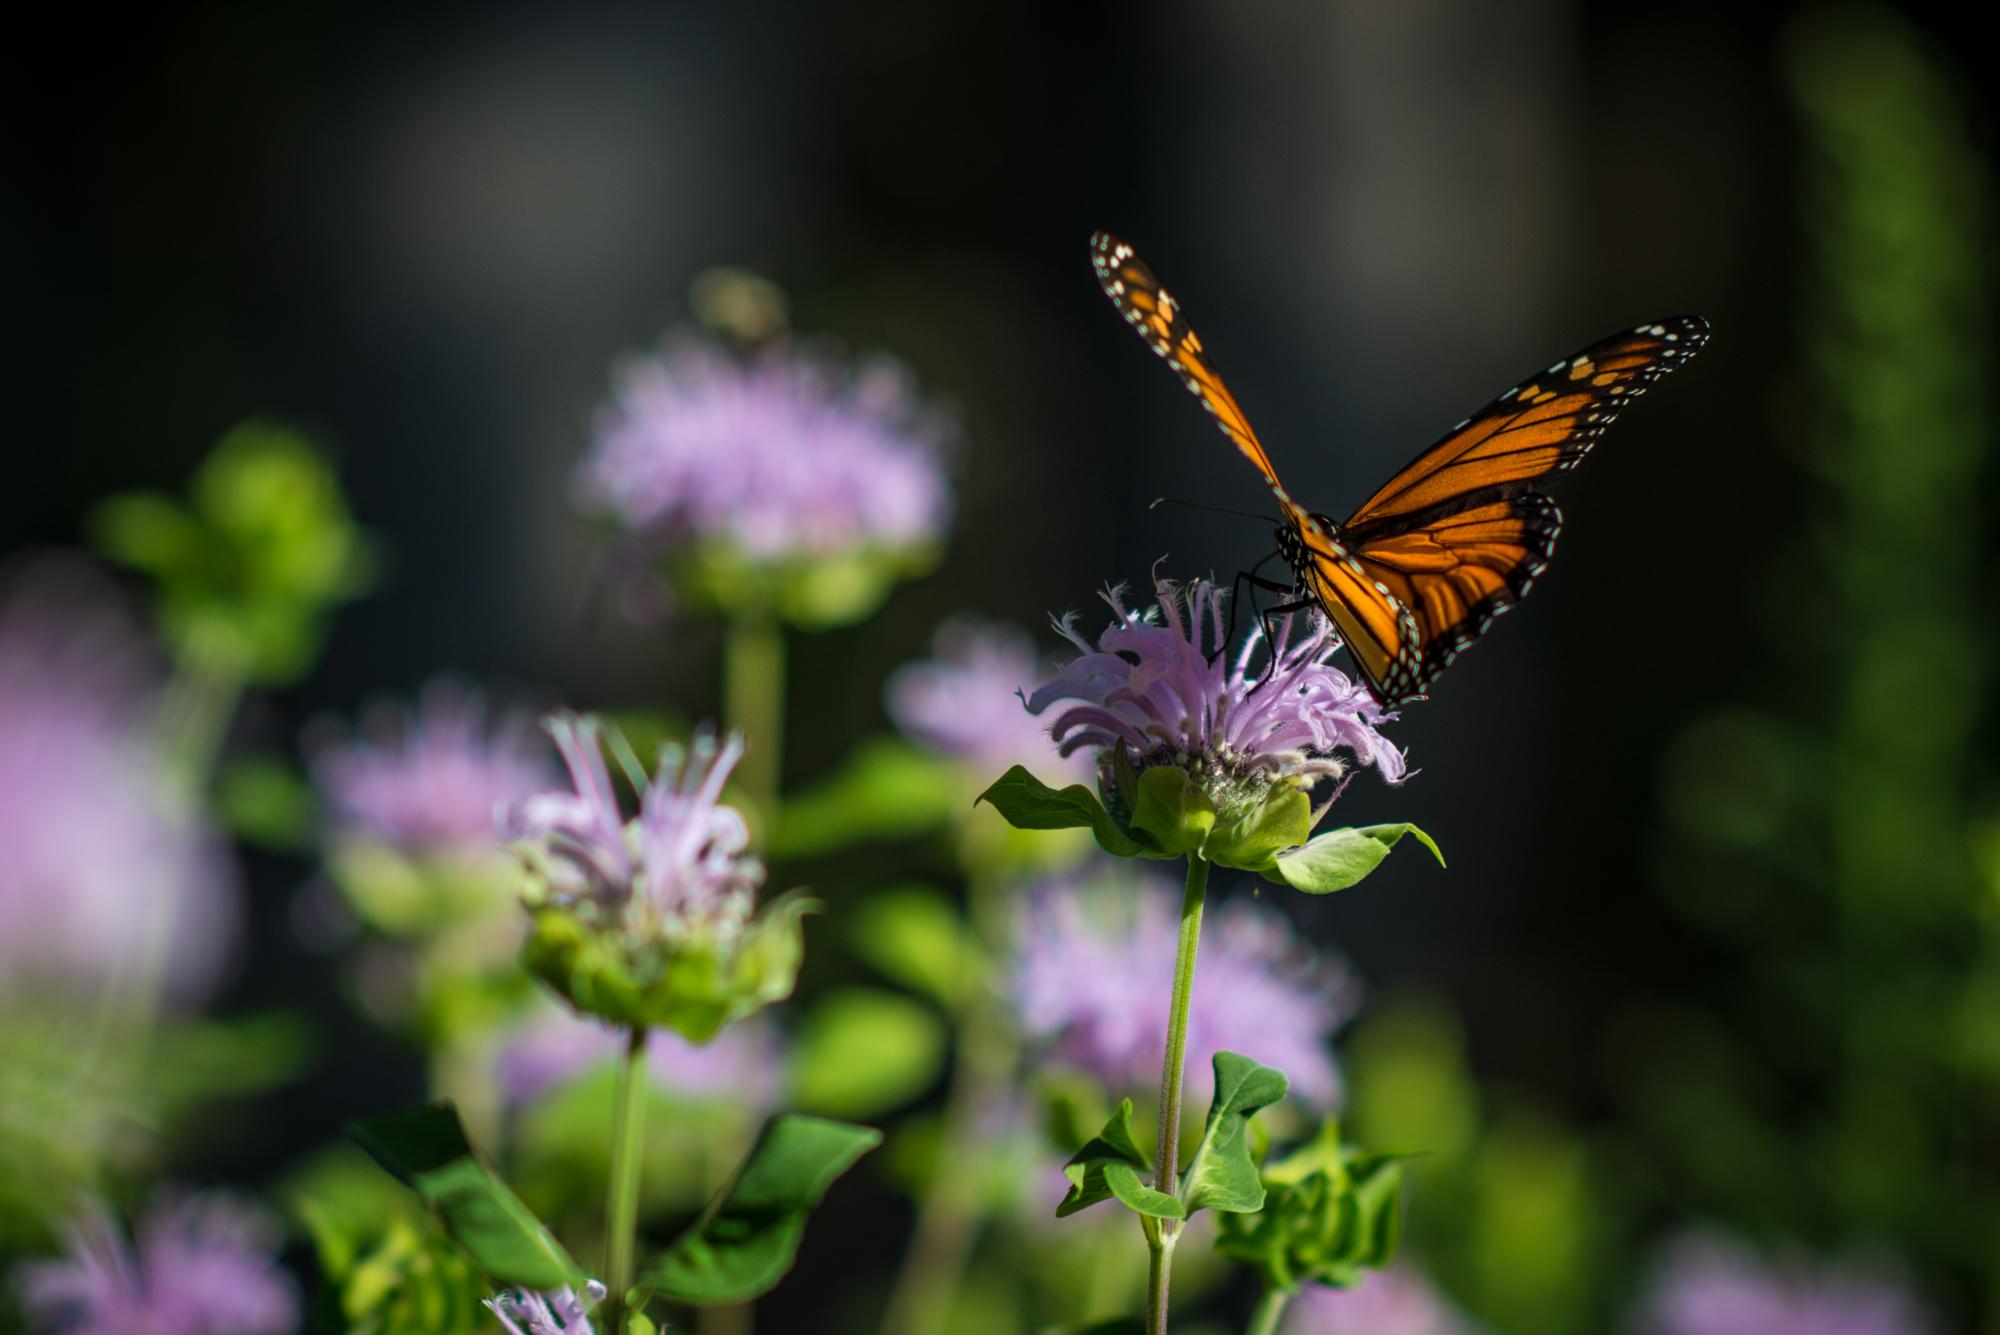 Monarch Butterfly on Wild Bergamot, David Newsom Photography